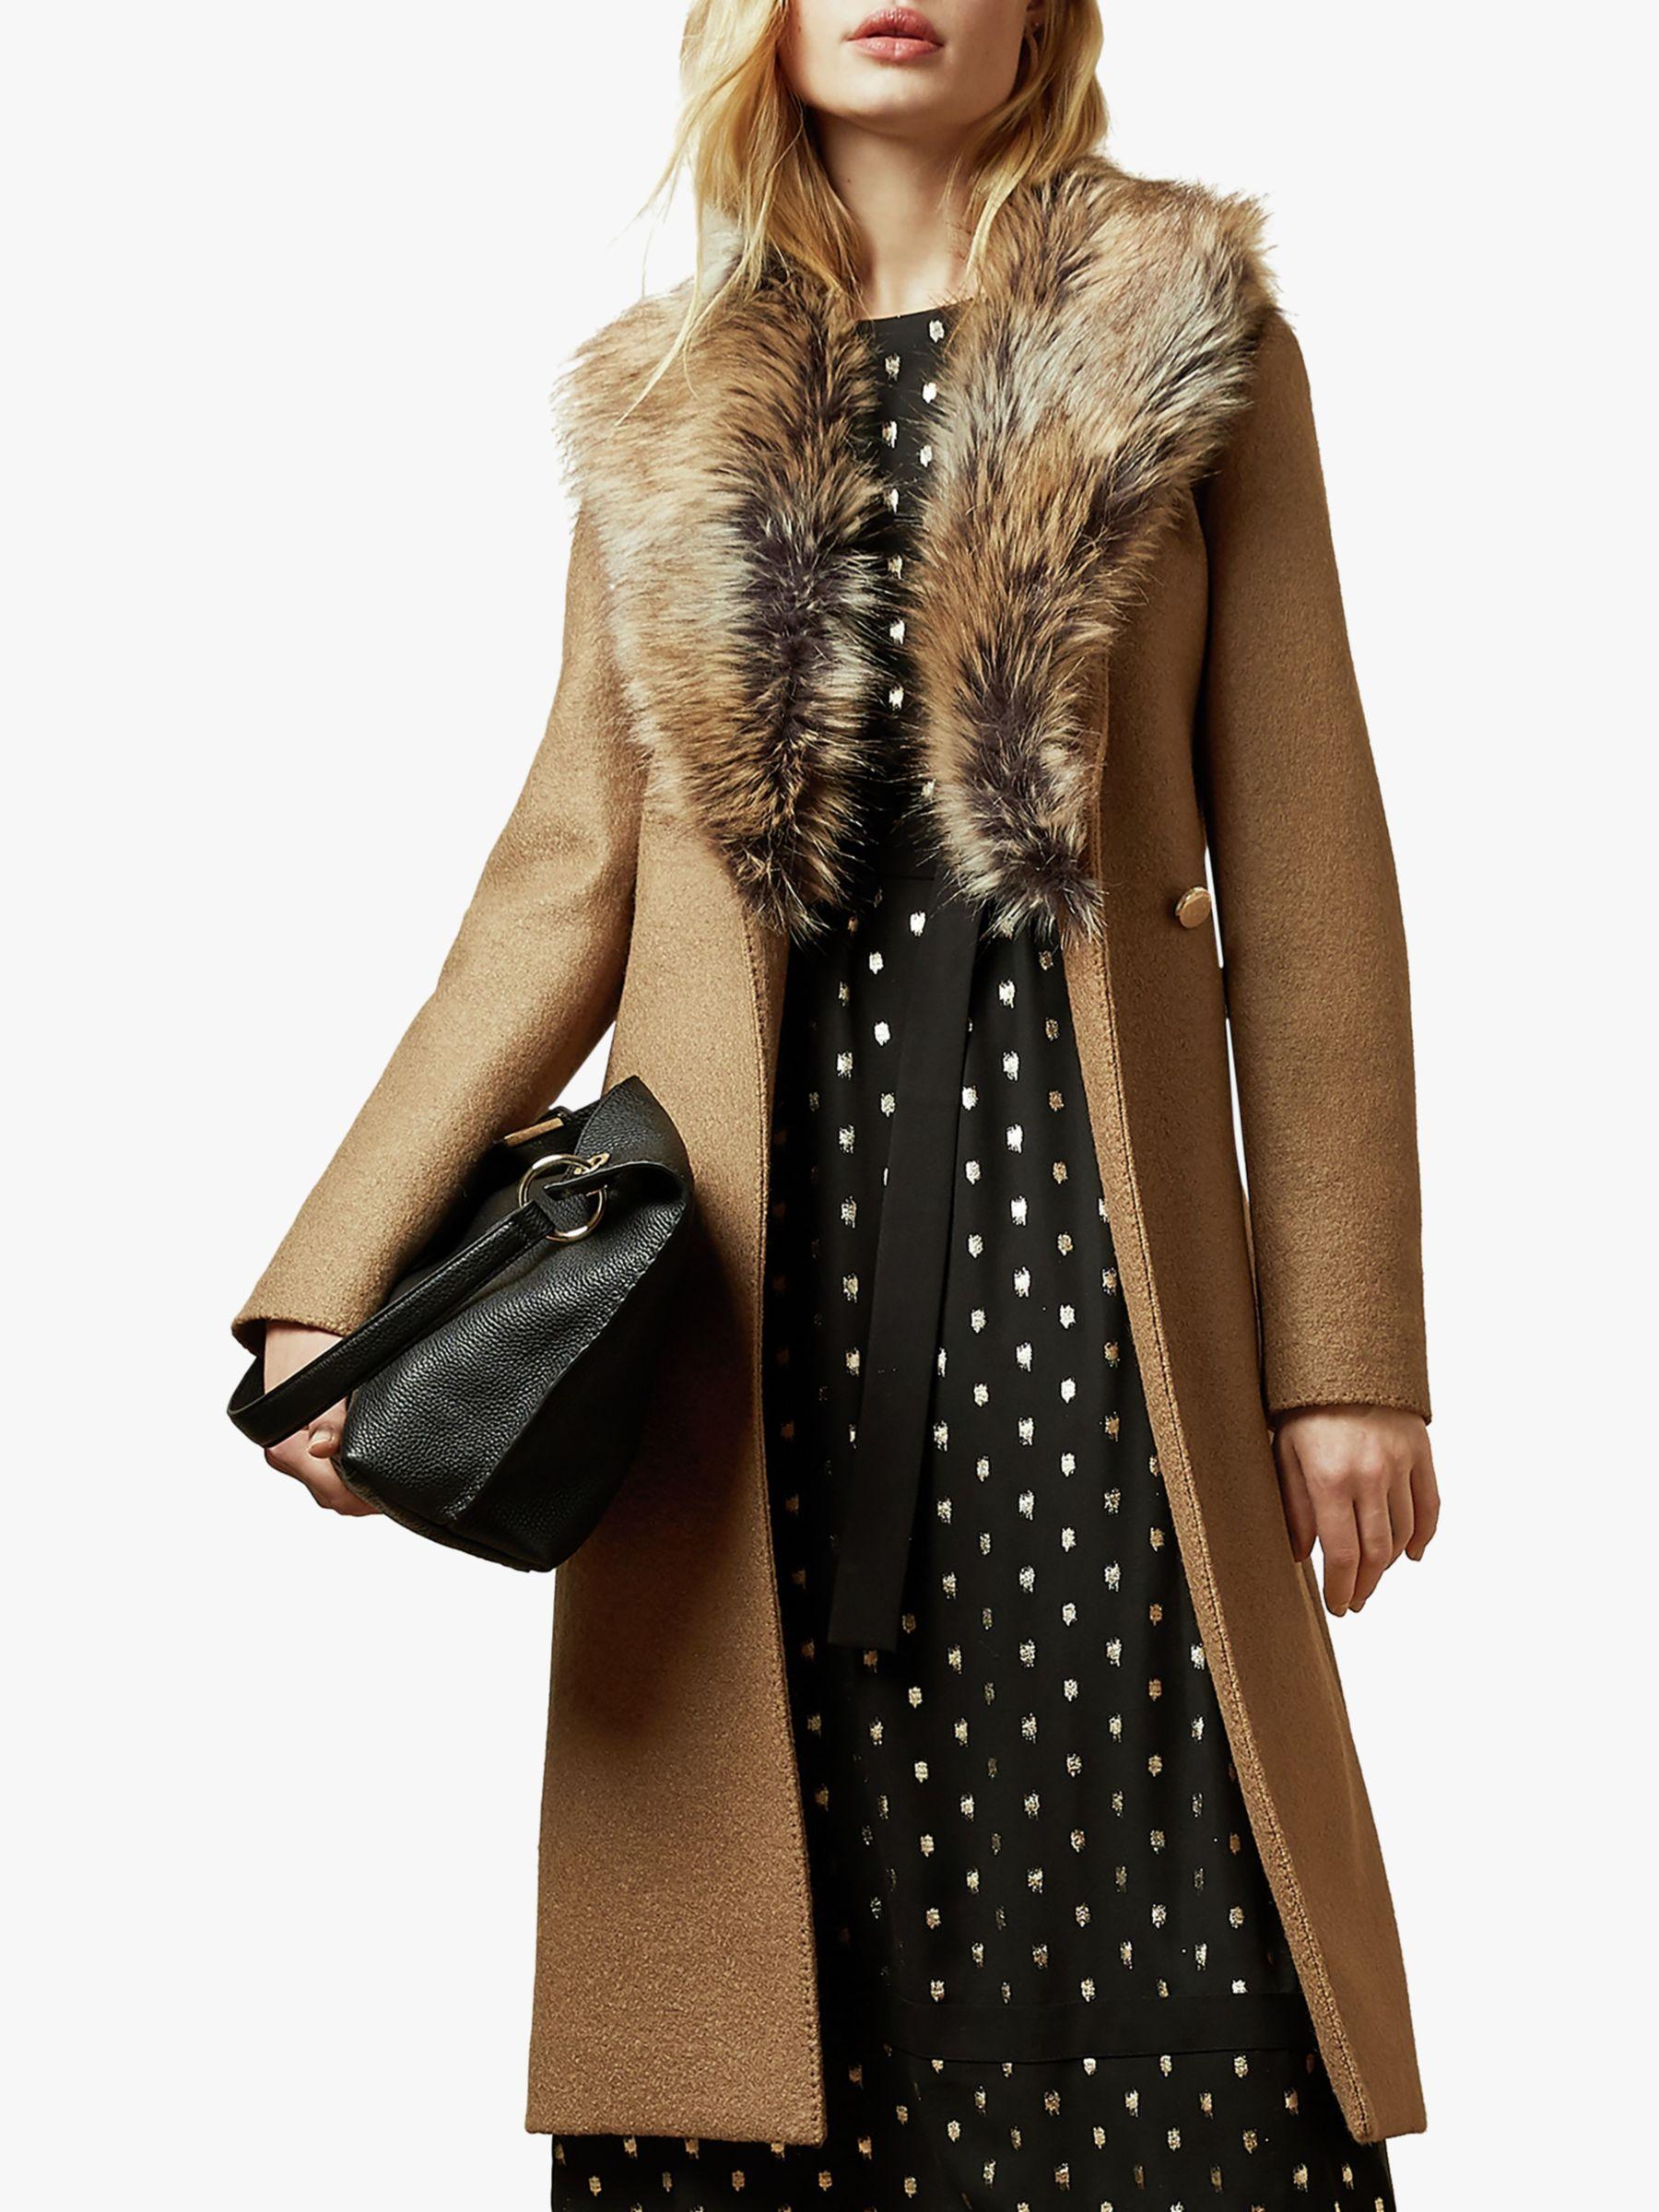 Ted Baker Ted Baker Corinna Faux Fur Trim Wool Coat, Brown Tan